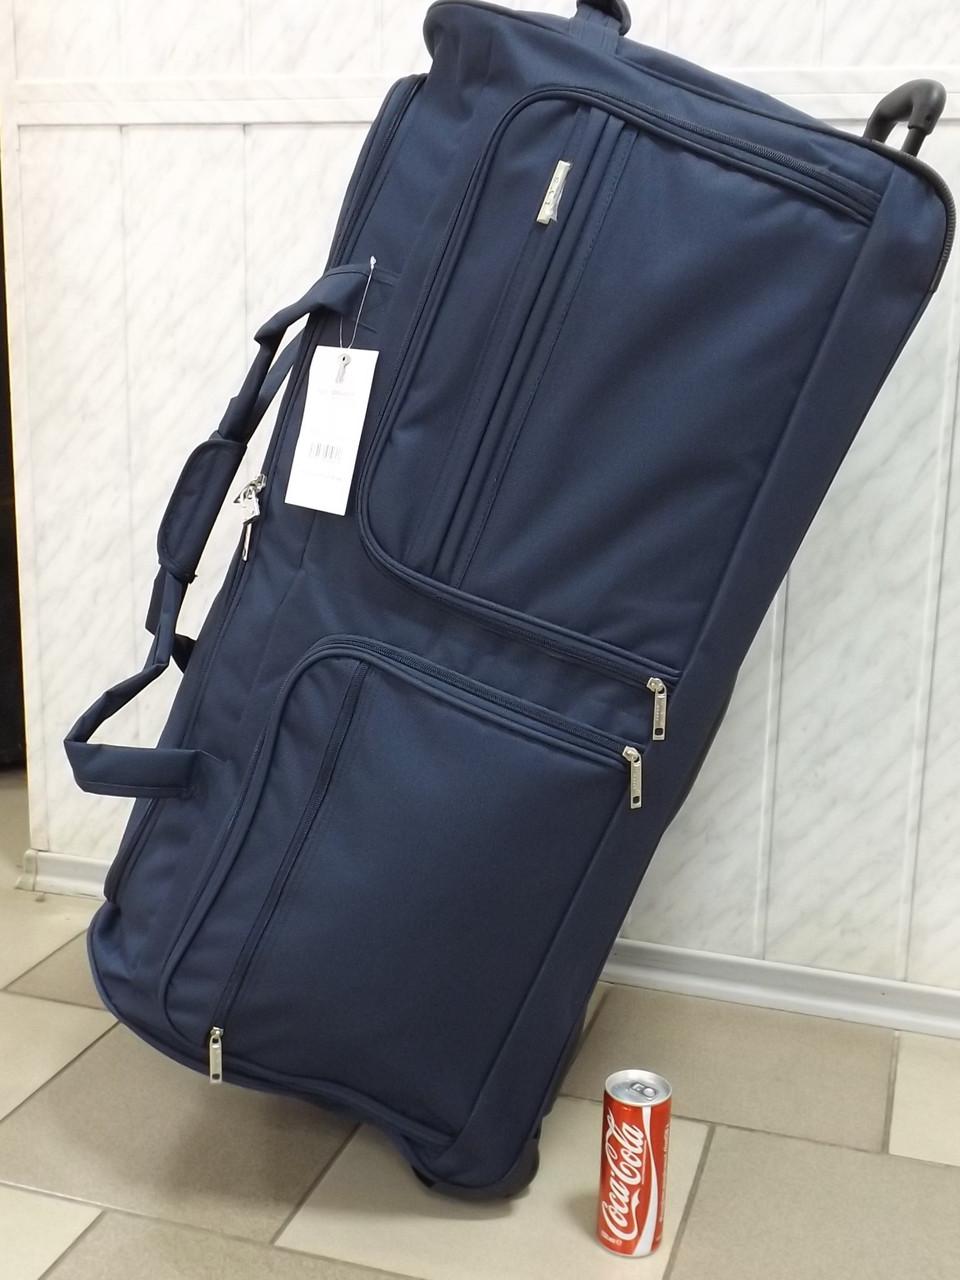 Рюкзак Для Рыбалки 38 Л. С Карманами